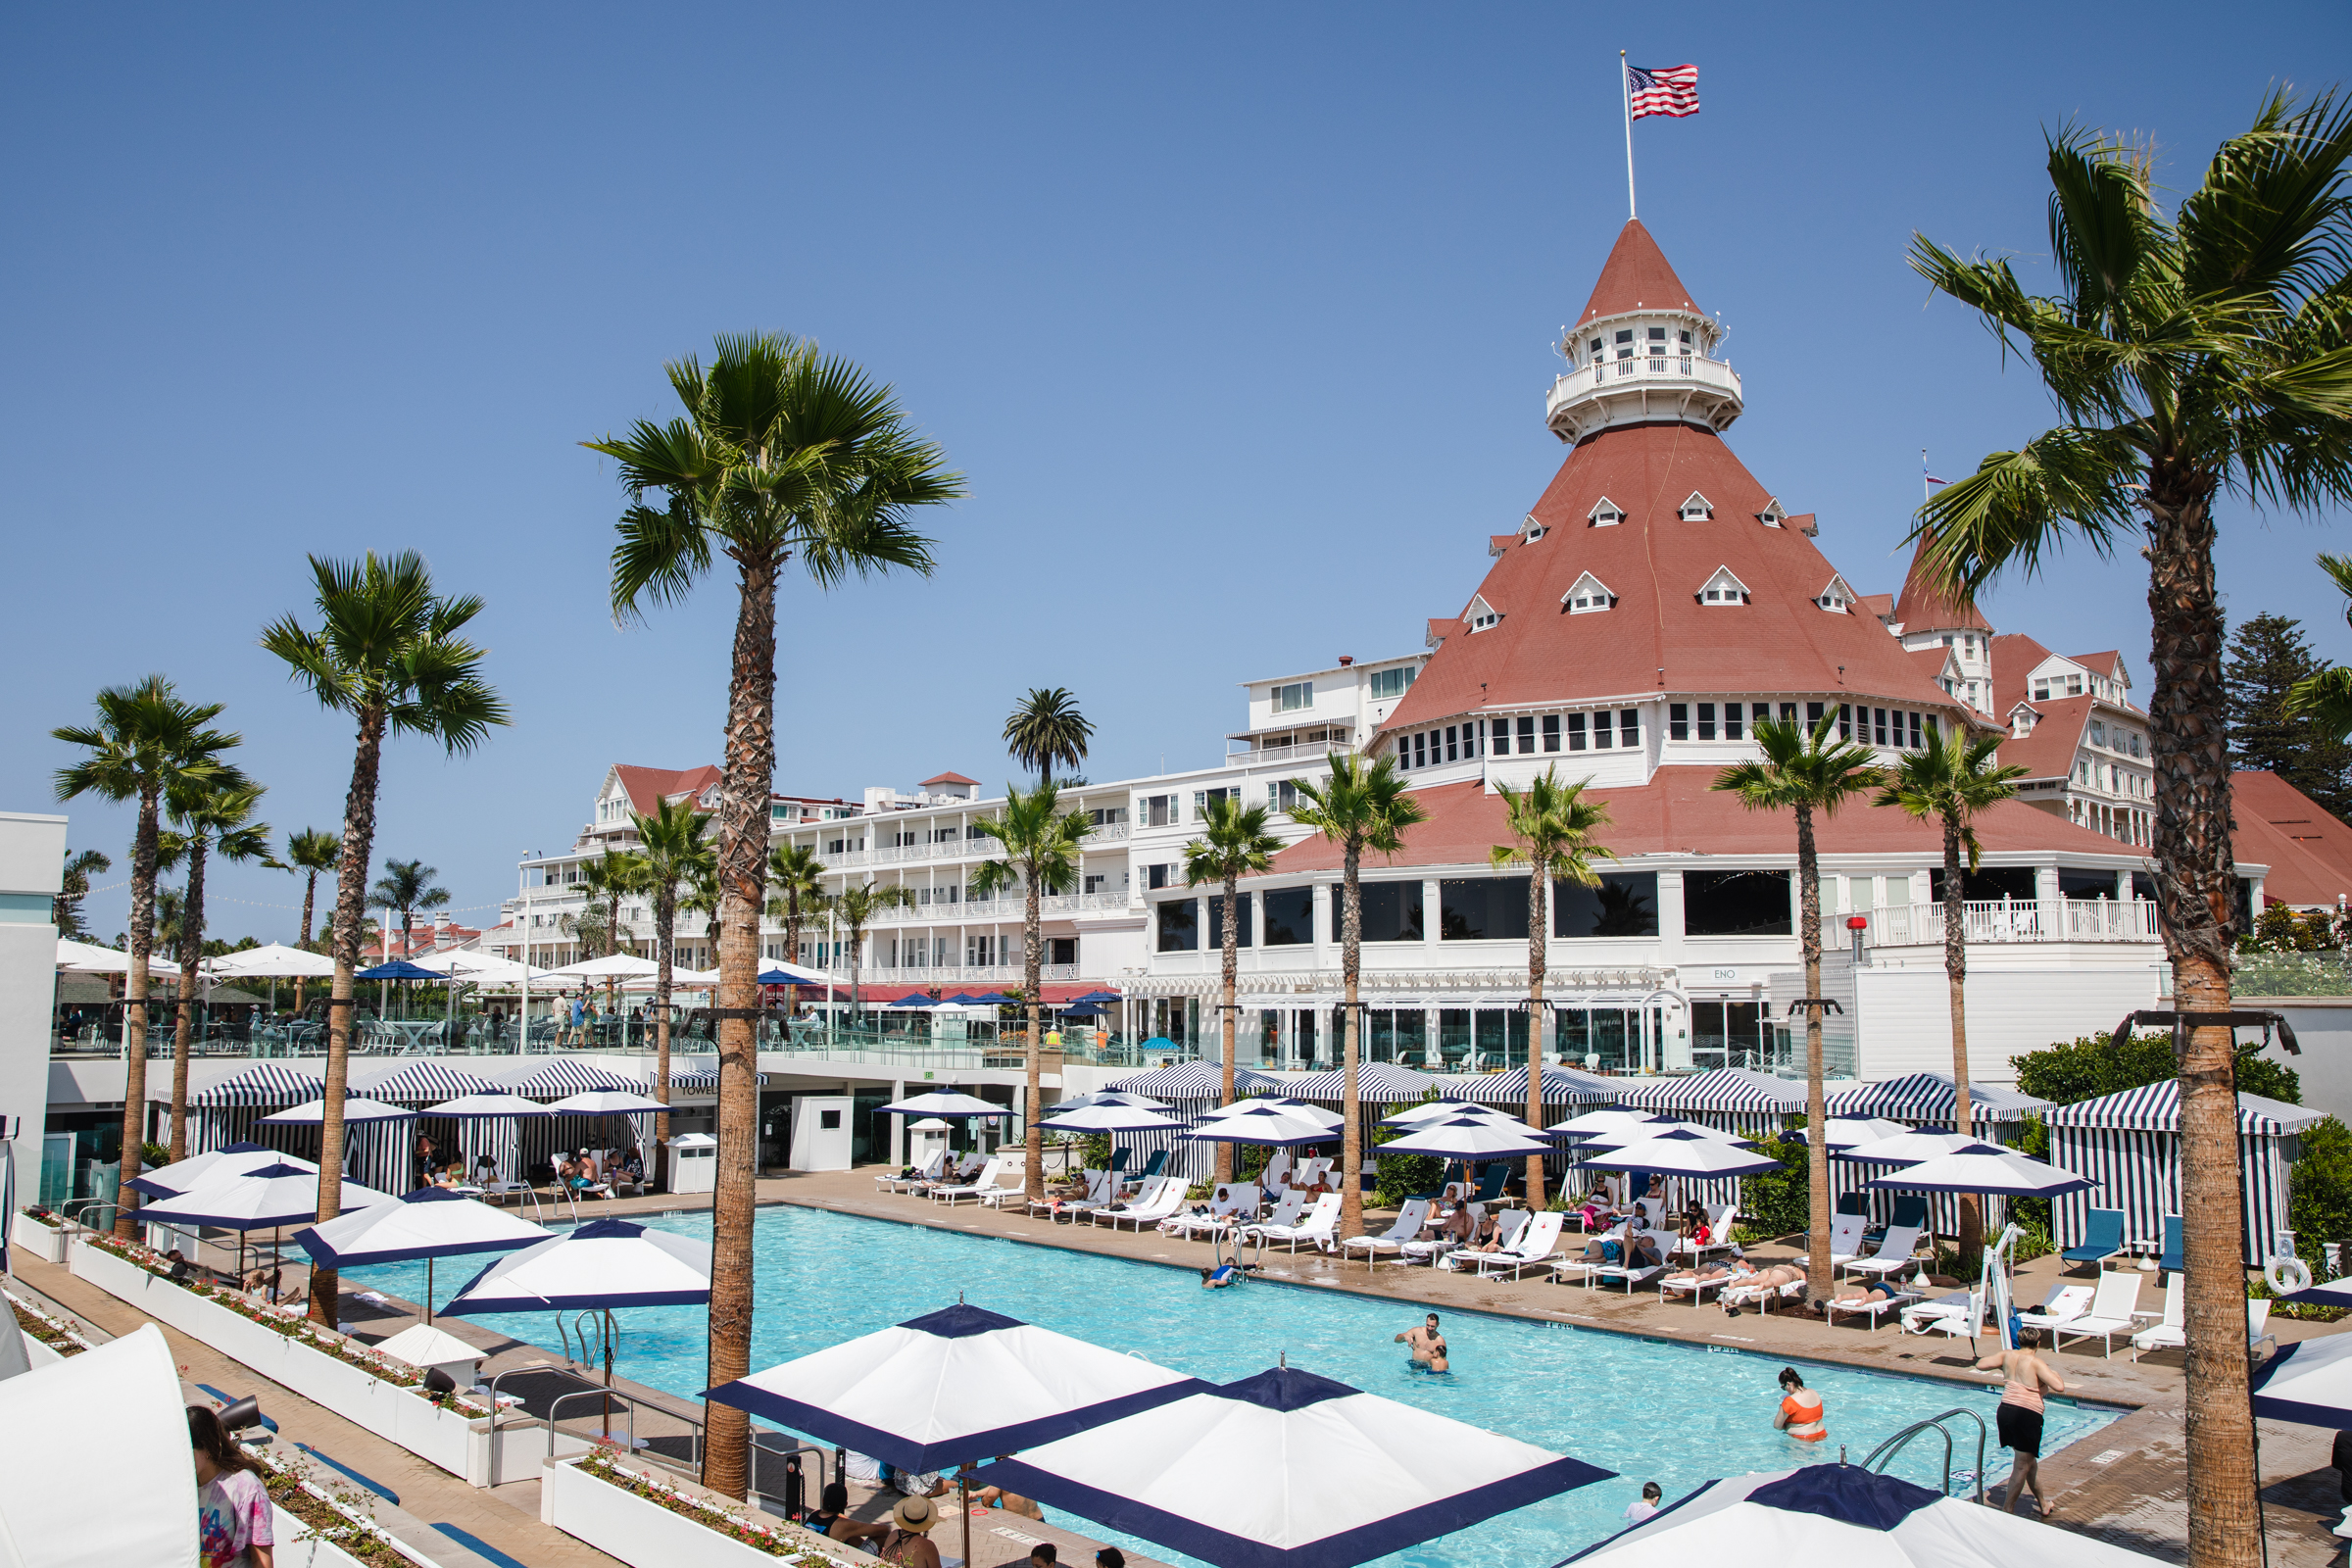 Hotel Del Coronado doesn't let a pandemic slow its $400M renovation